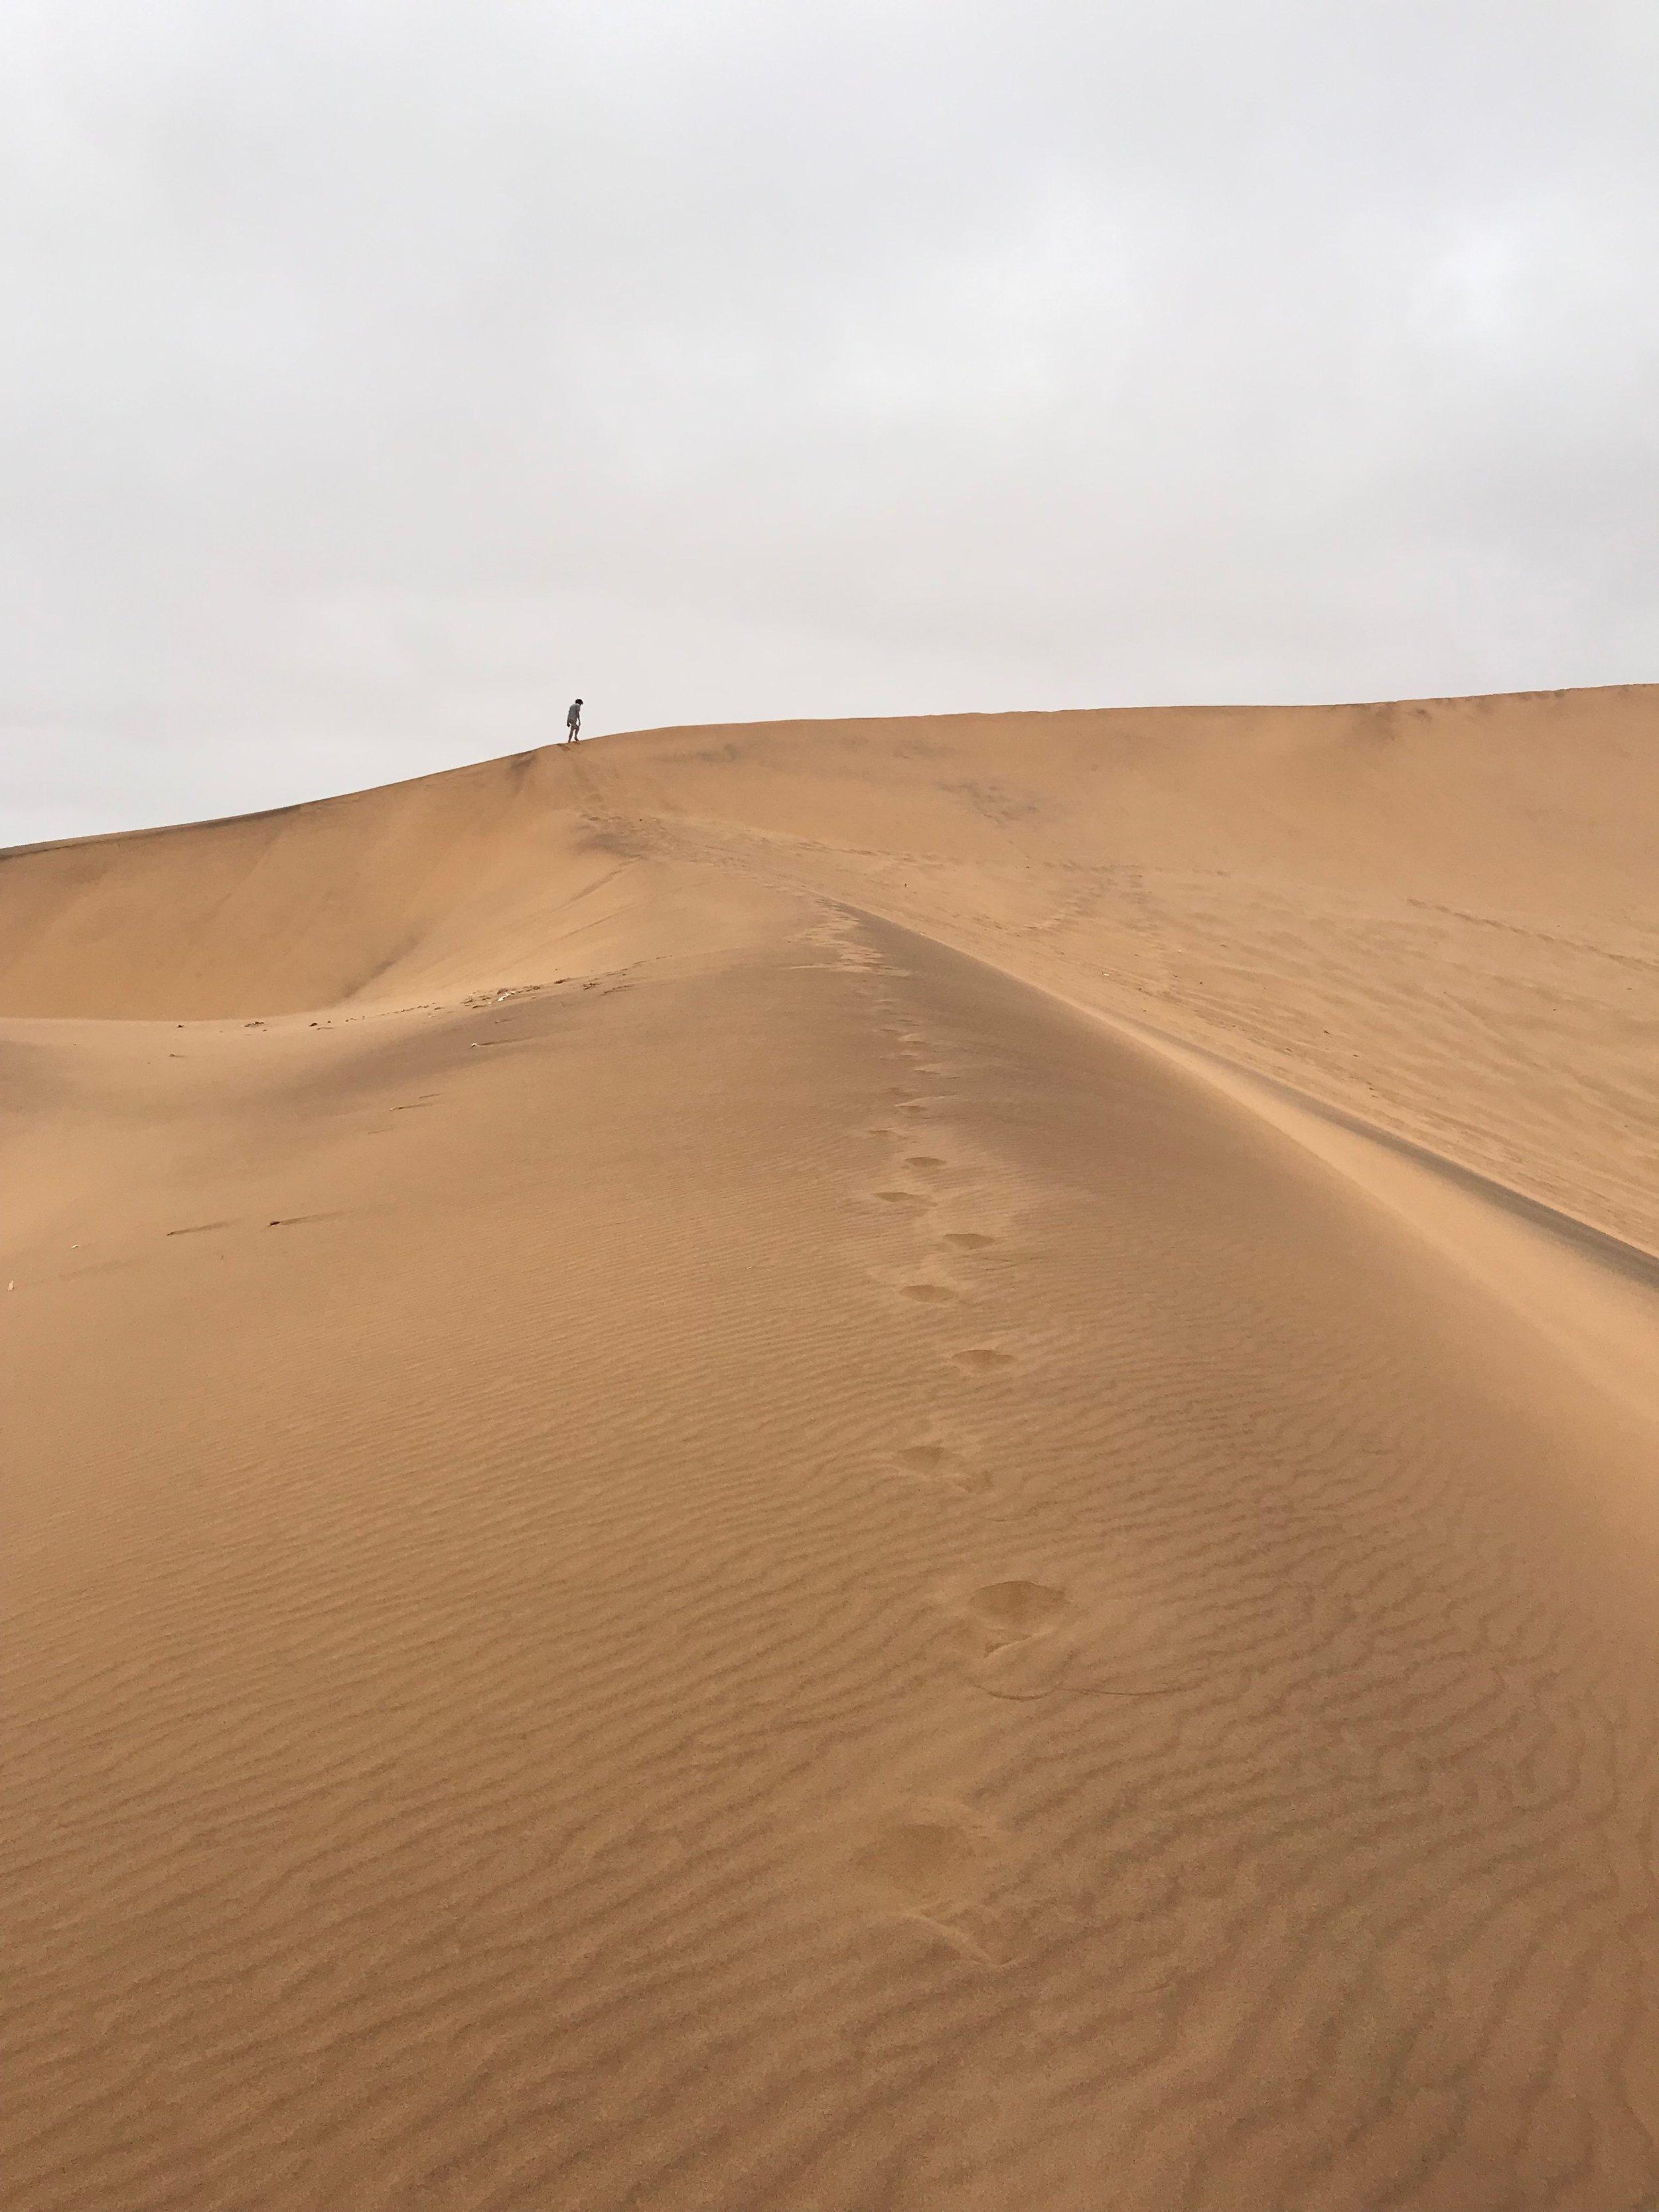 Big dunes; little people